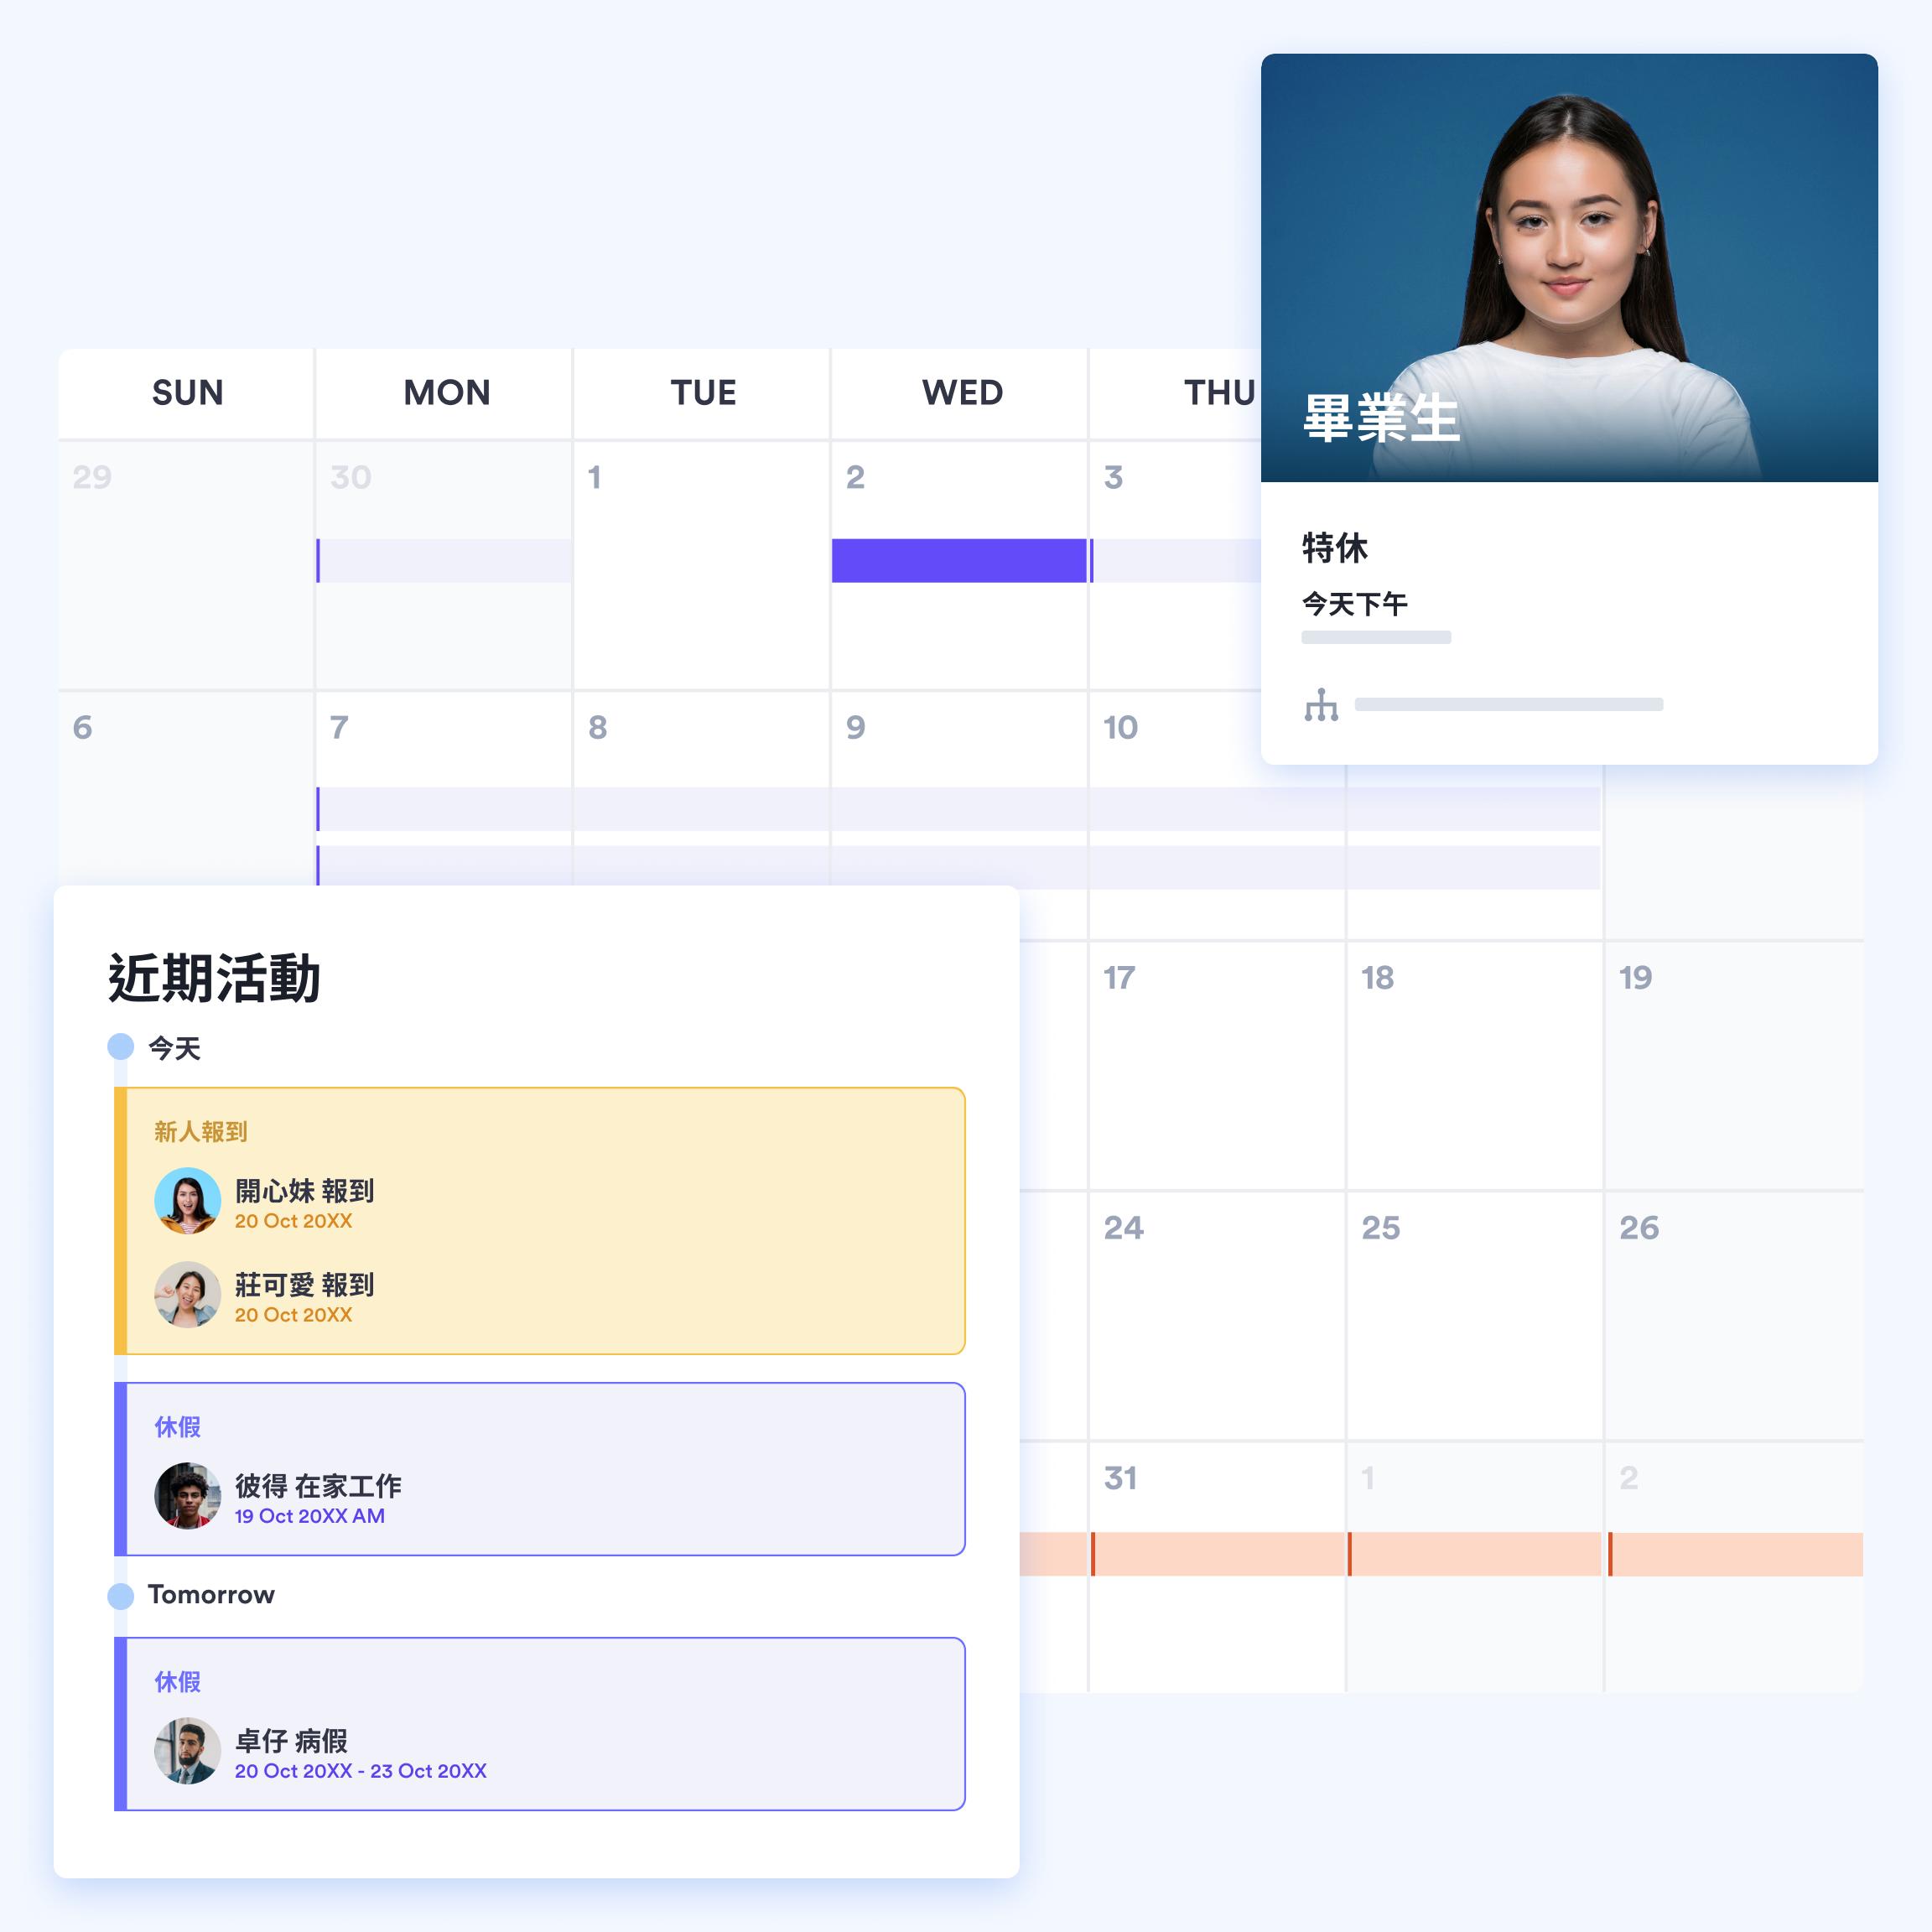 Swingvy雲端人資系統有著行事曆功能,還能串接iCalendar跟Google行事曆。